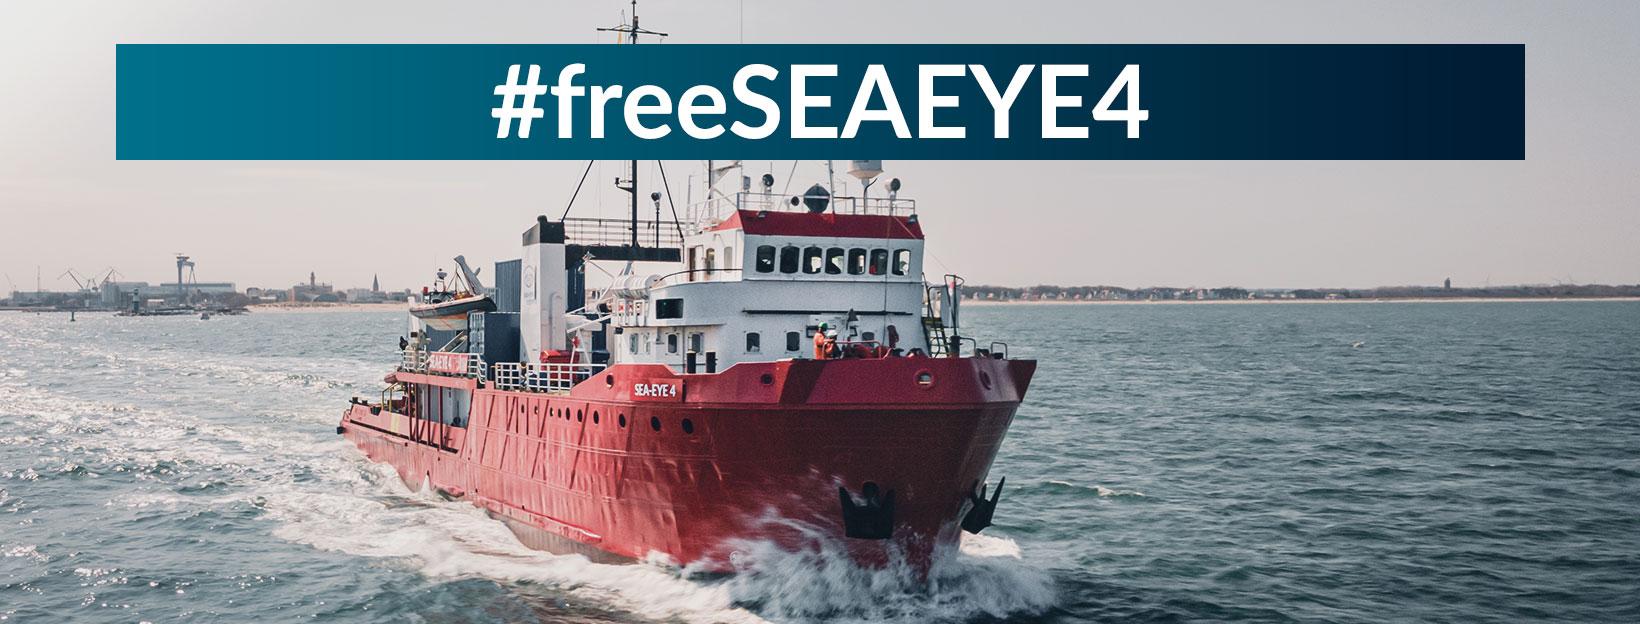 #freeSEAEYE4